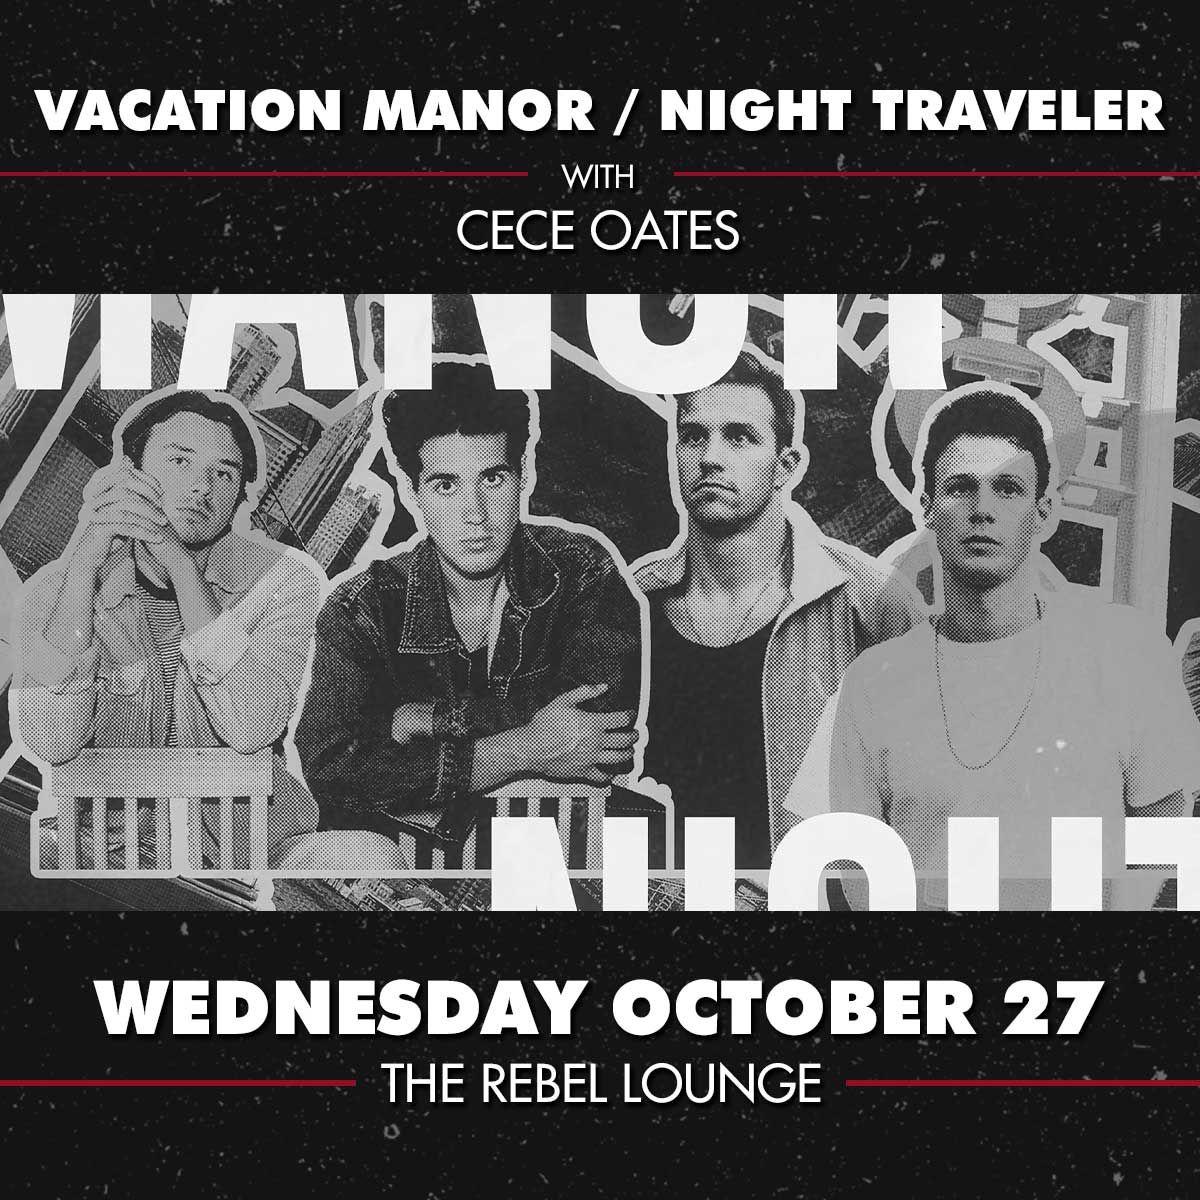 VACATION MANOR and NIGHT TRAVELER: